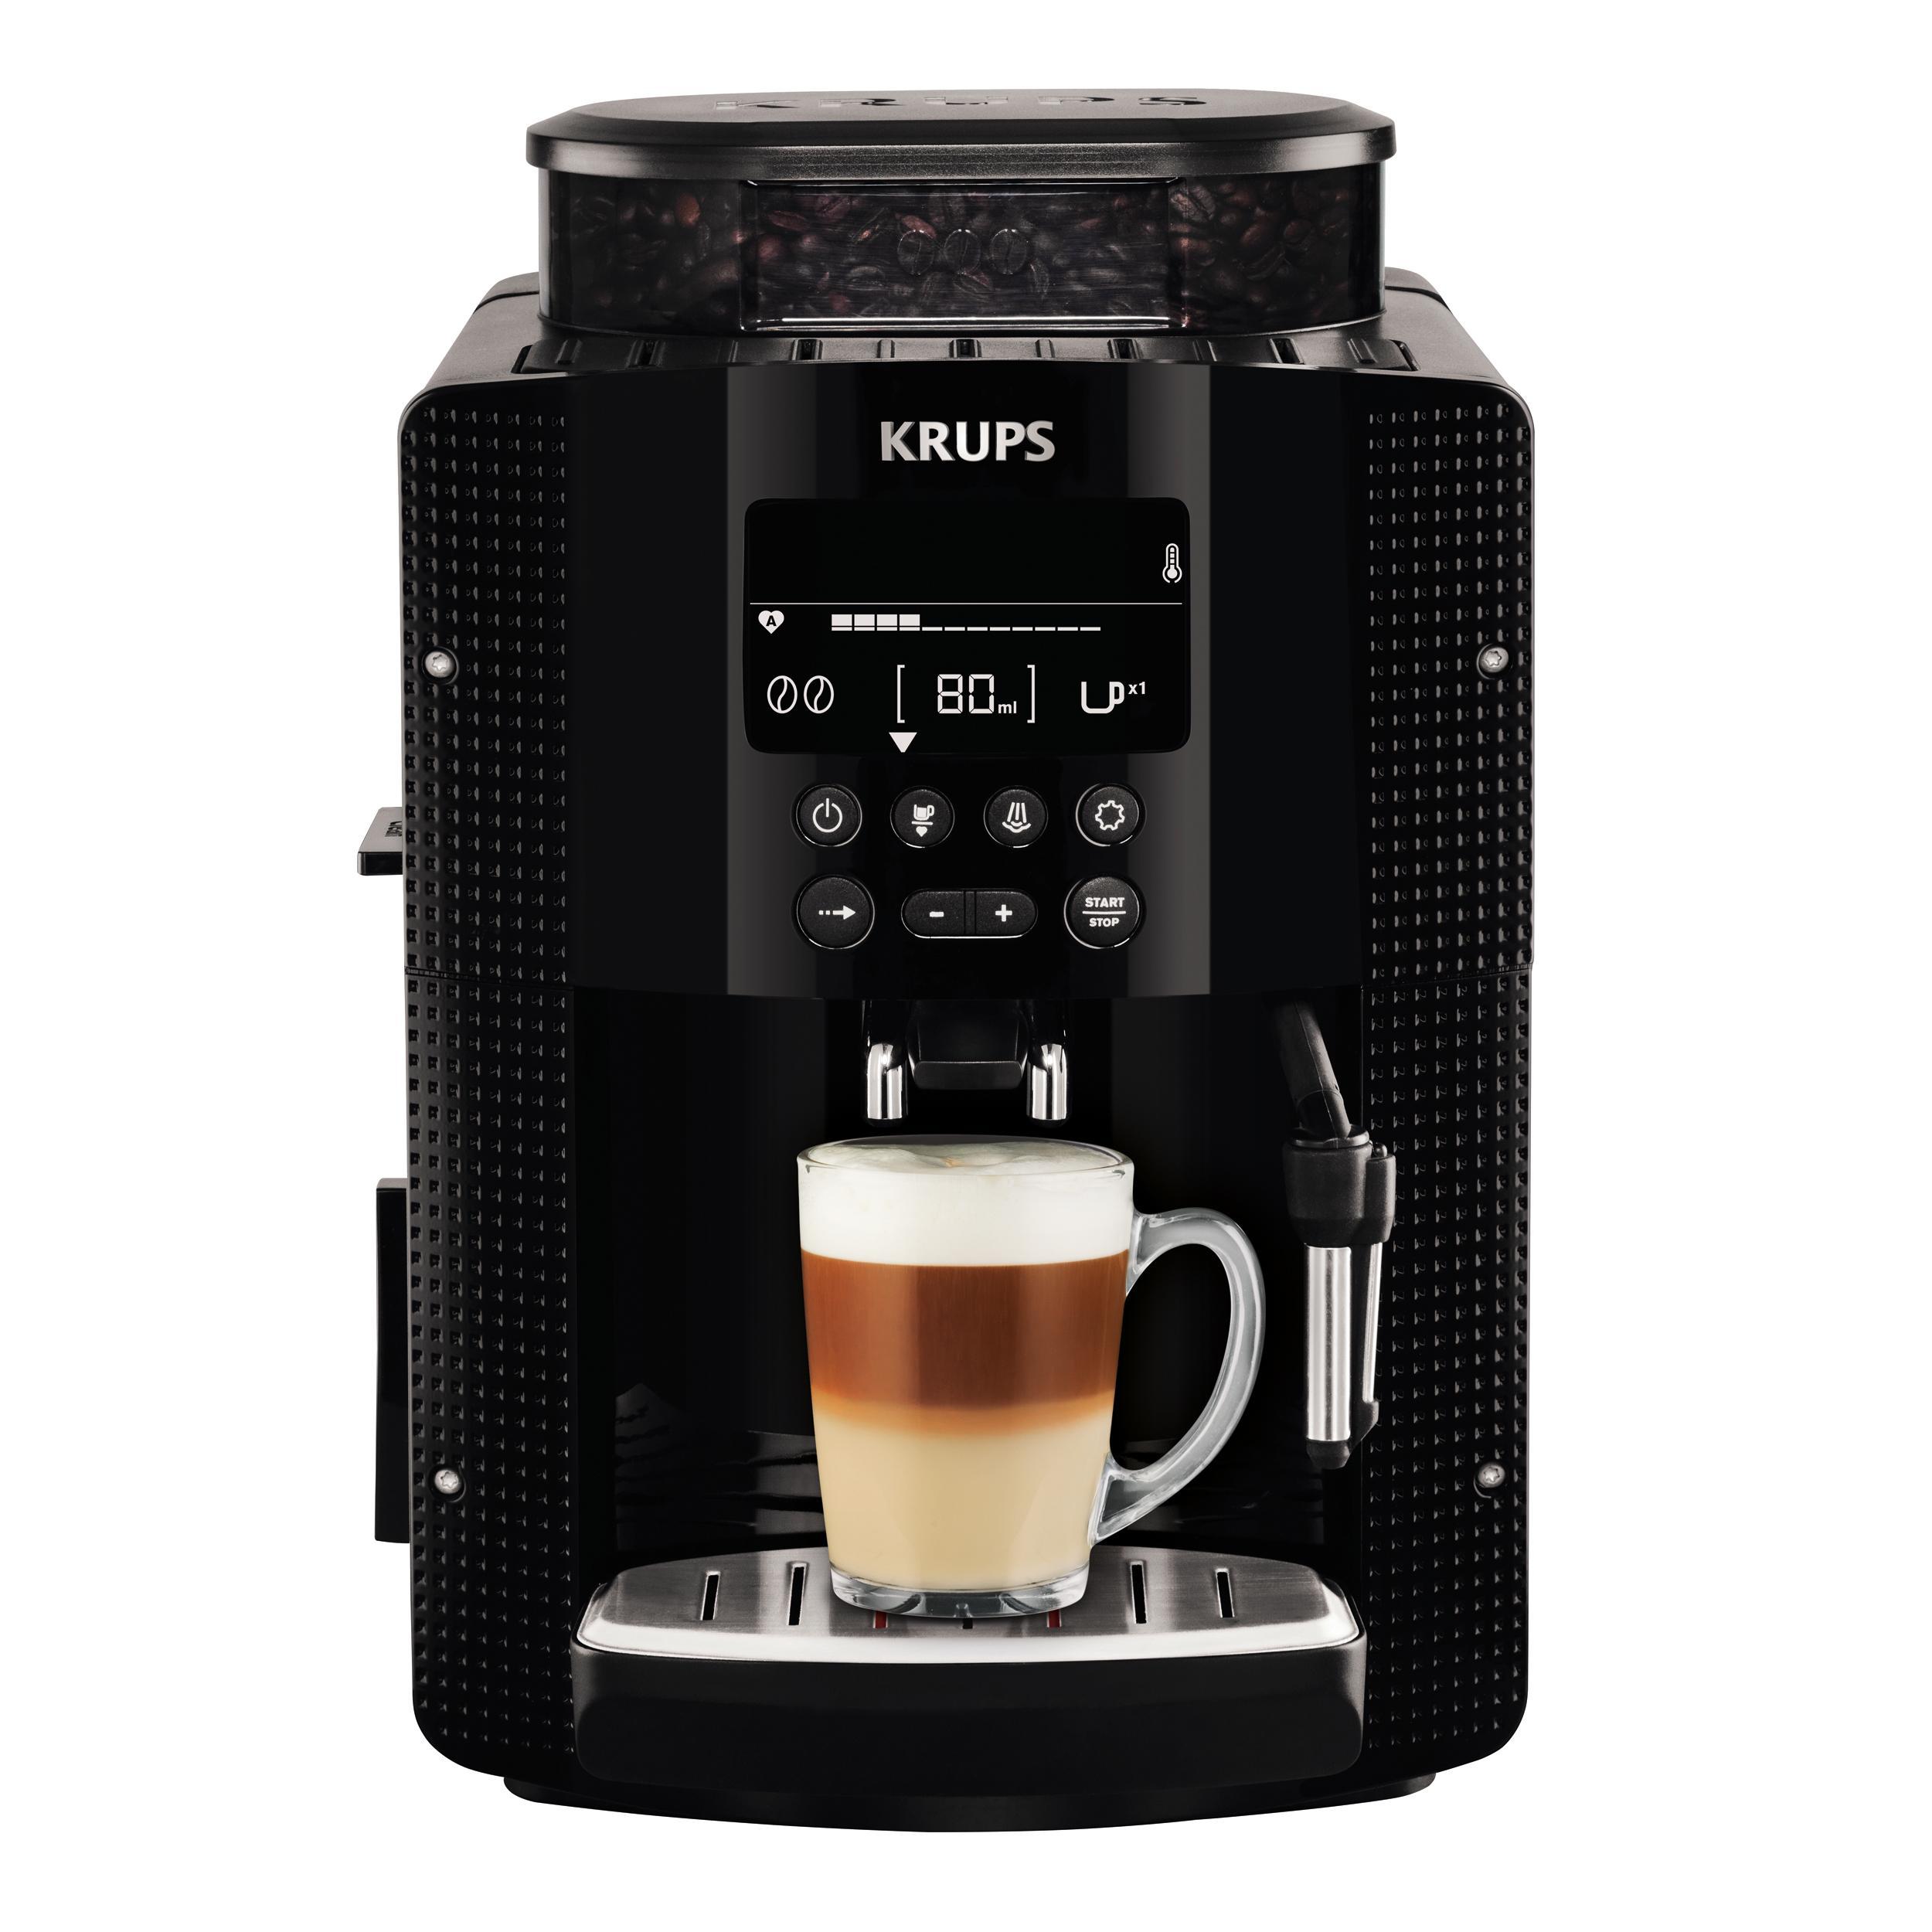 [Lokal Saturn Aachen] - Krups EA8150 Espresso/Kaffee-Vollautomat